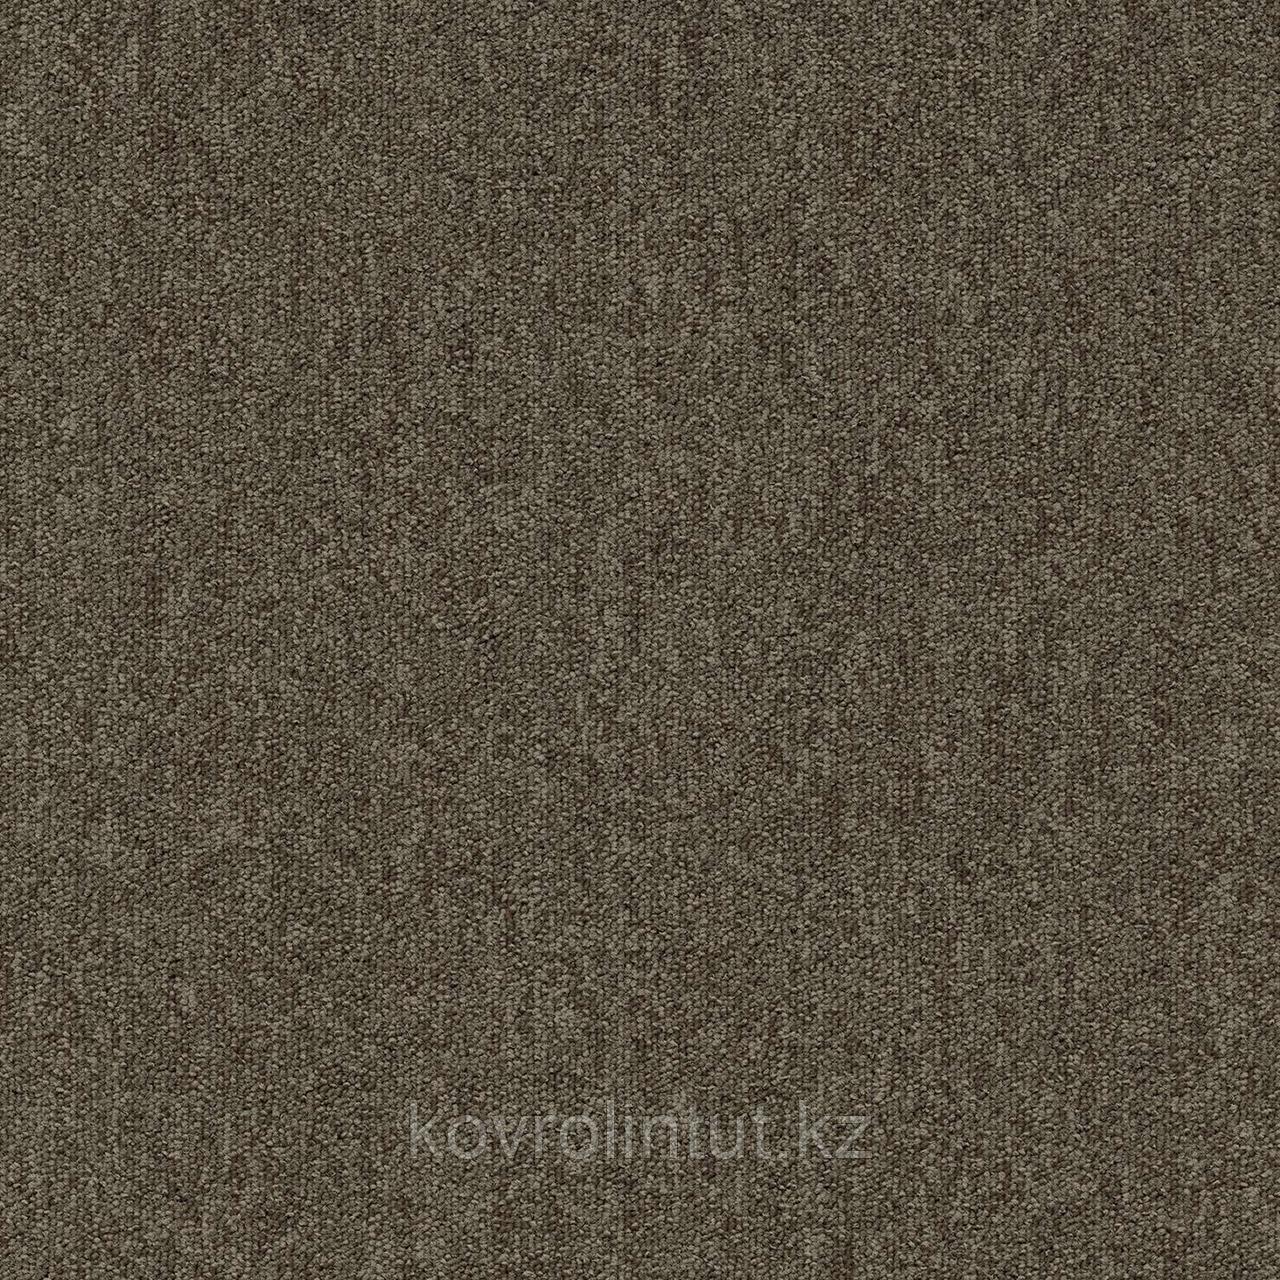 Плитка ковровая Modulyss First 601, 100% PA